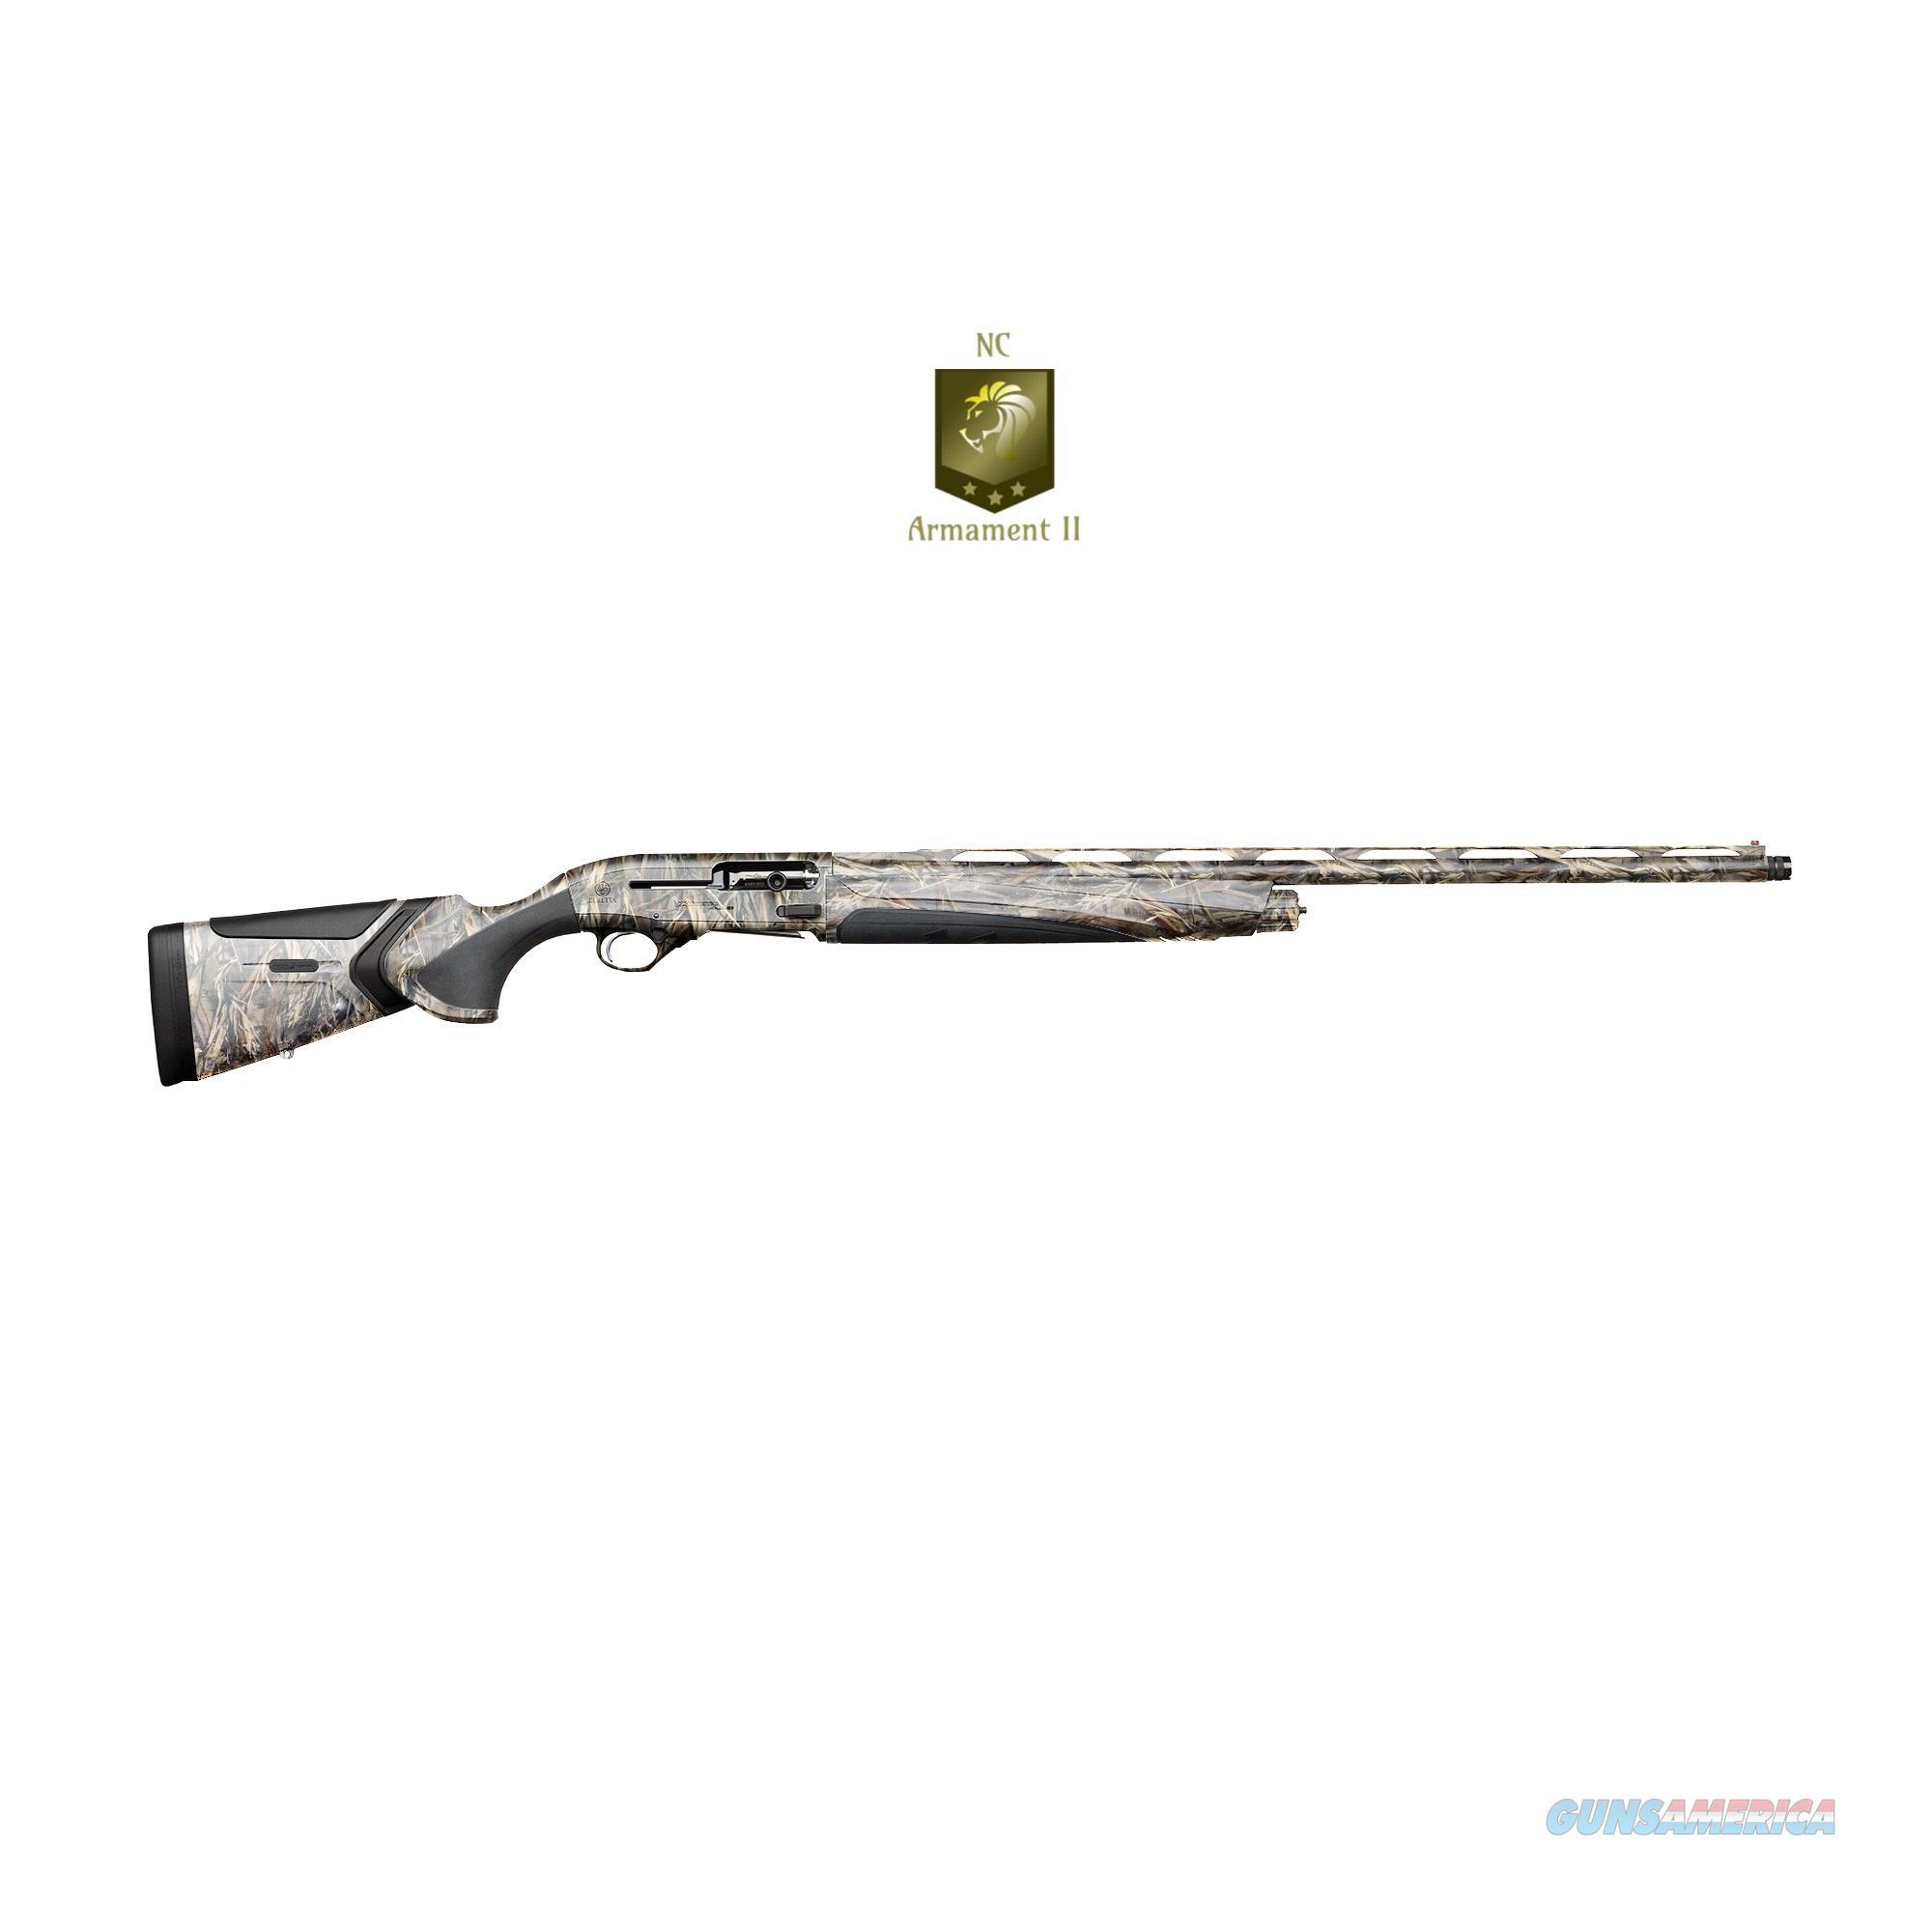 "Beretta A400 Xtreme PLUS KO Semi Automatic 12 Gauge 28"" True Timber DRT Camo  Guns > Shotguns > Beretta Shotguns > Single Barrel"